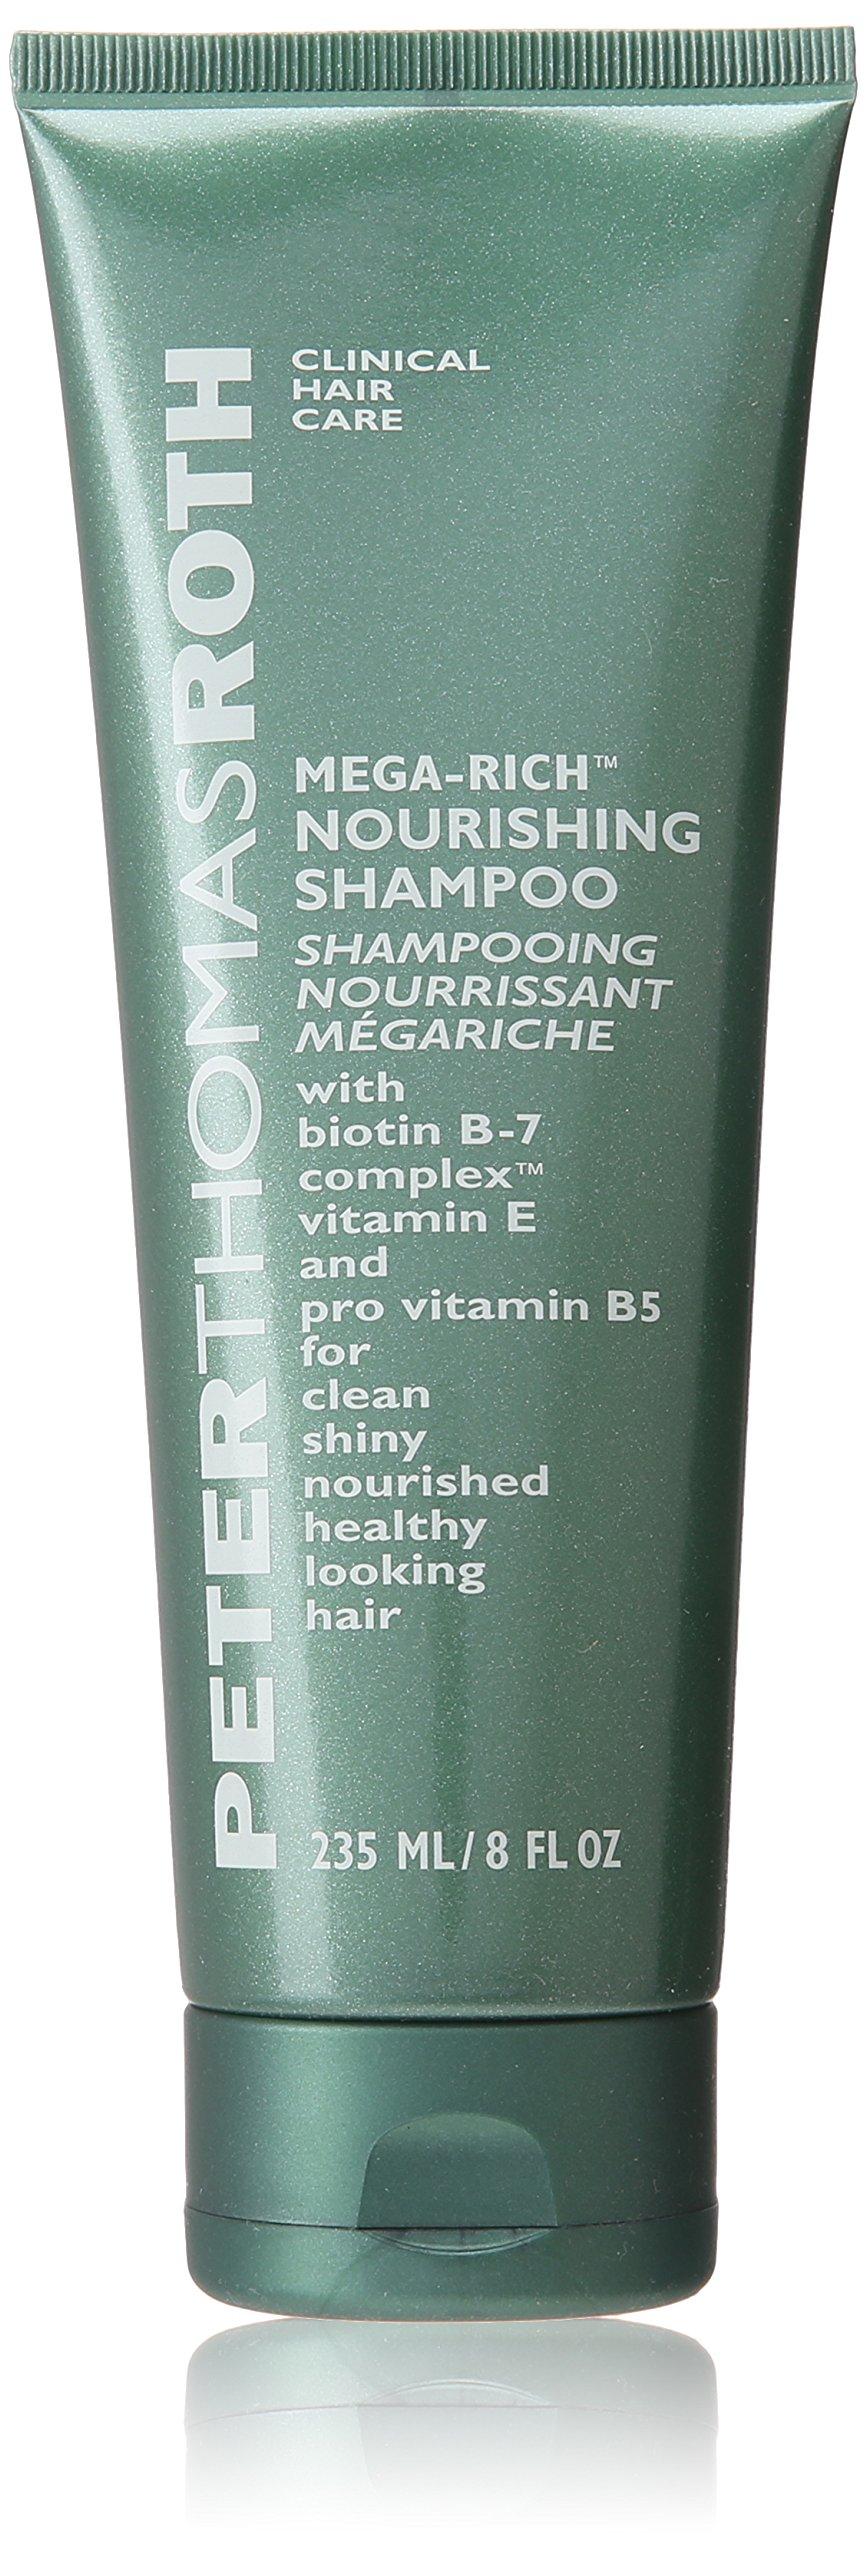 Peter Thomas Roth Mega Rich Shampoo, 8 Fluid Ounce by Peter Thomas Roth (Image #1)